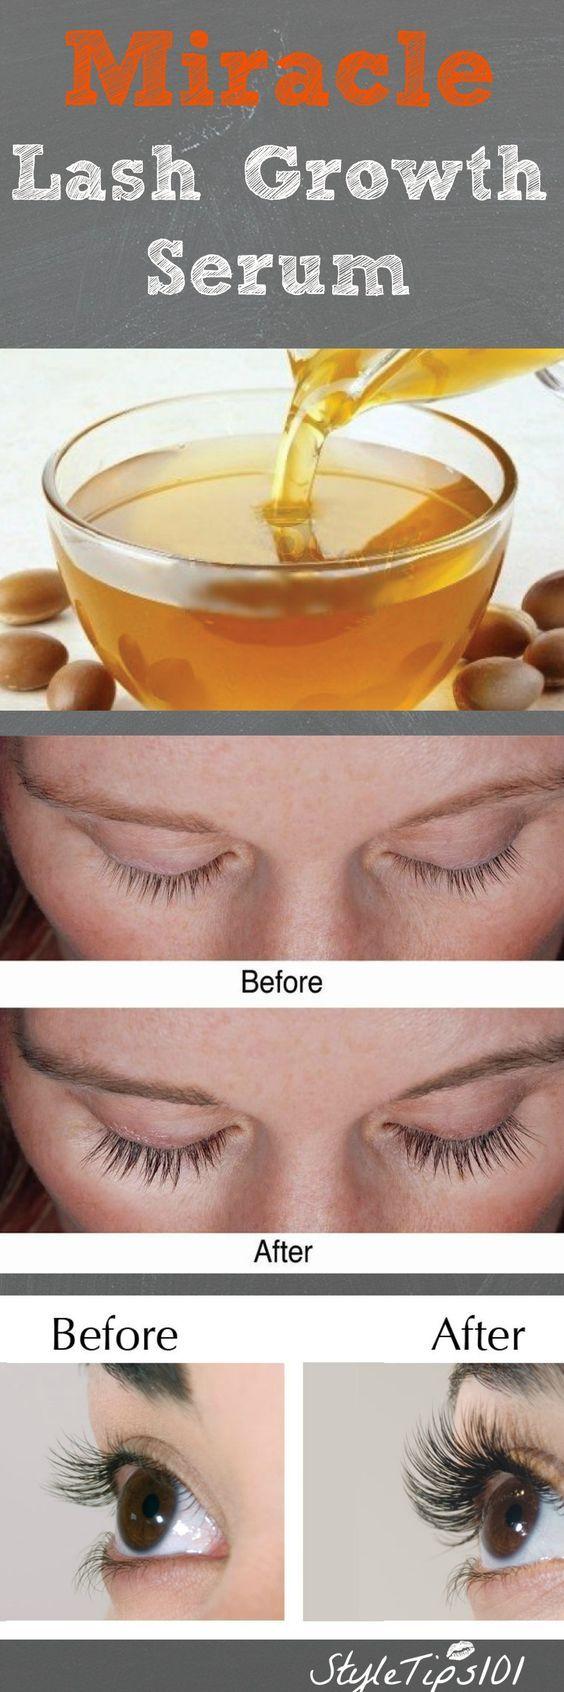 Coconut oil + castor oil = miracle lash growth!!!